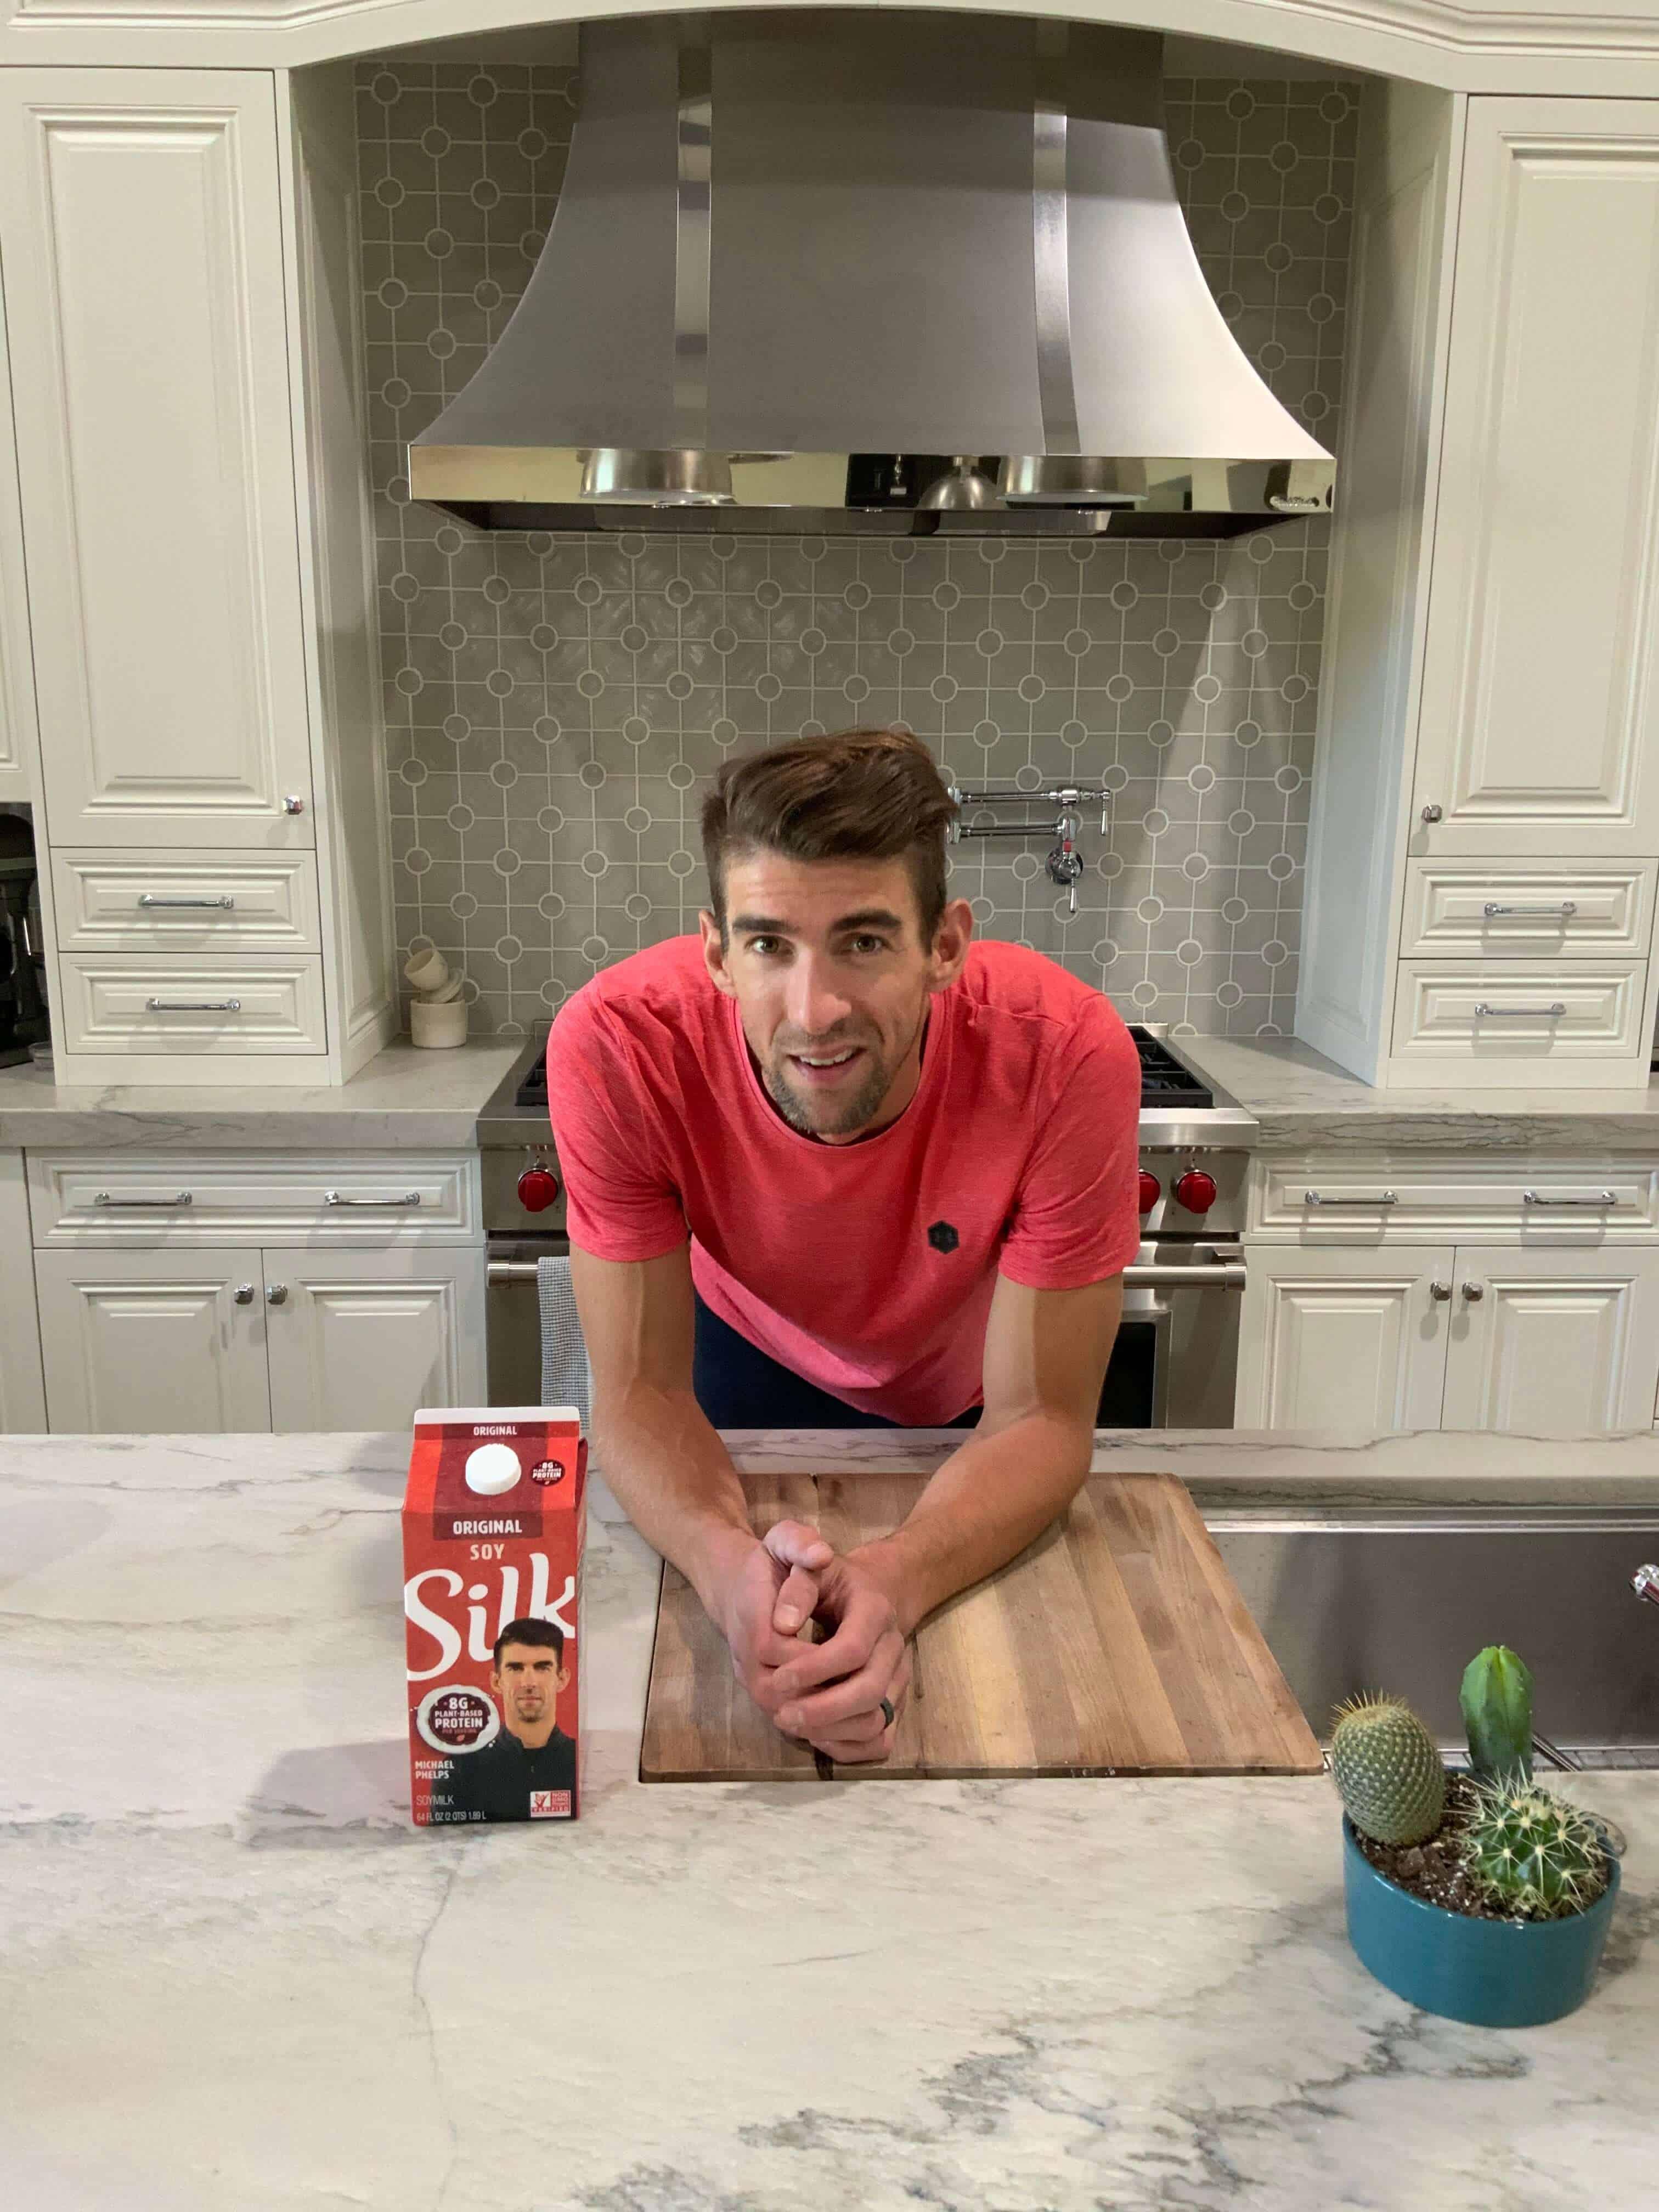 Michael Phelps, Silk, Soymilk